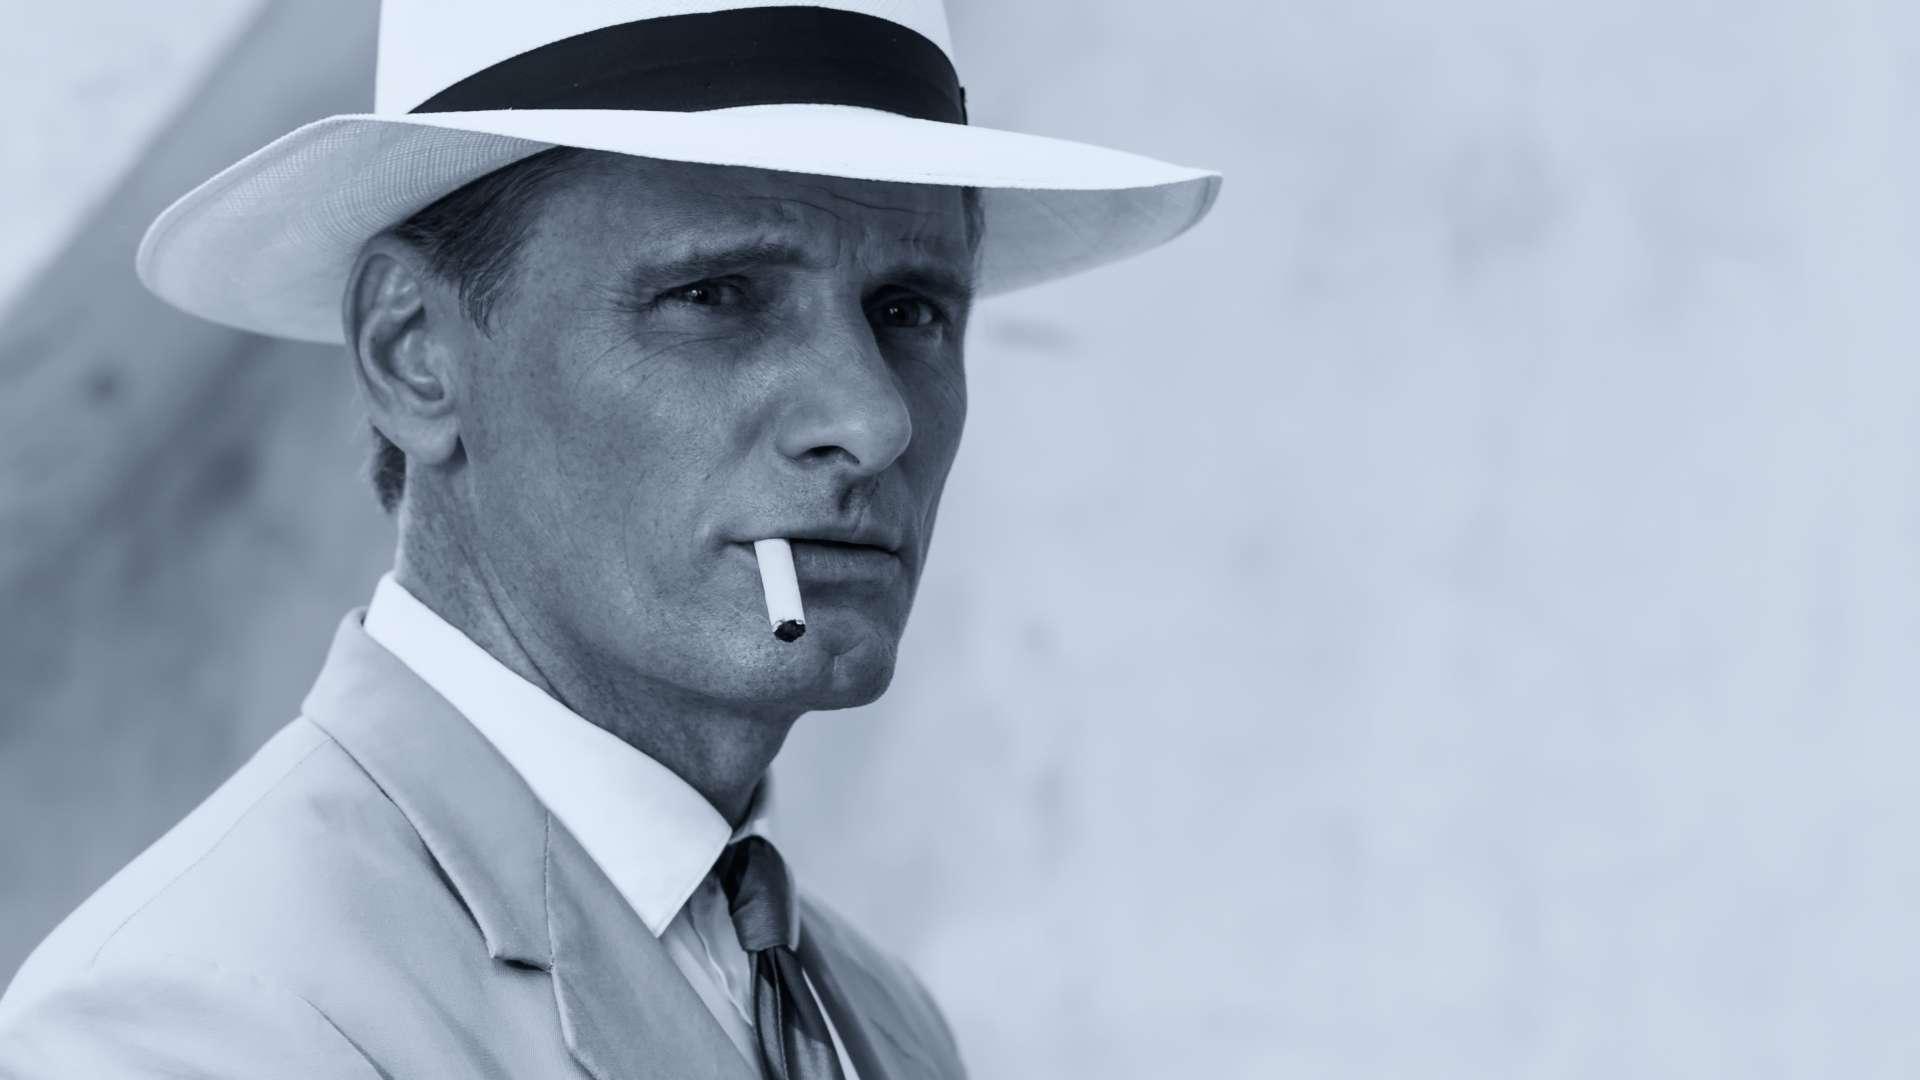 Wallpaper Hd Wallpaper Viggo Mortensen Actor Portrait Cigarette 1080p 1920x1080